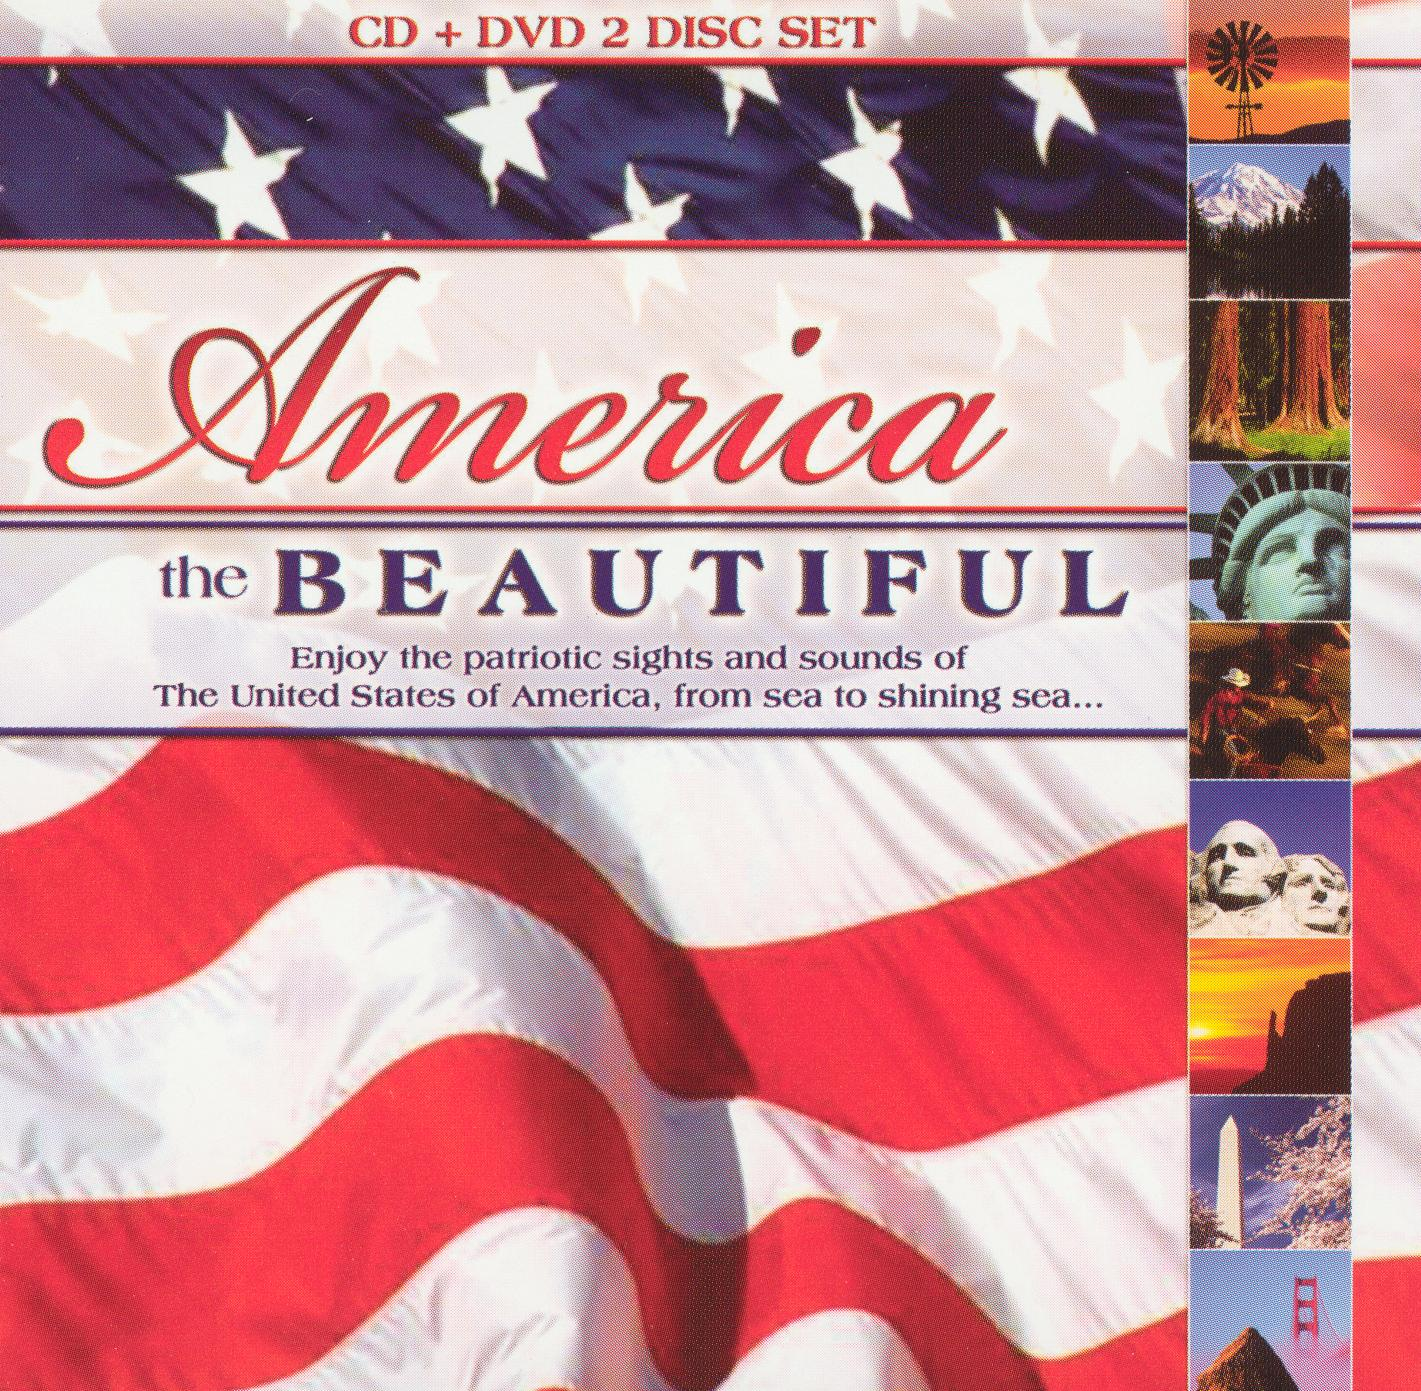 America the Beautiful: The Visual Sights